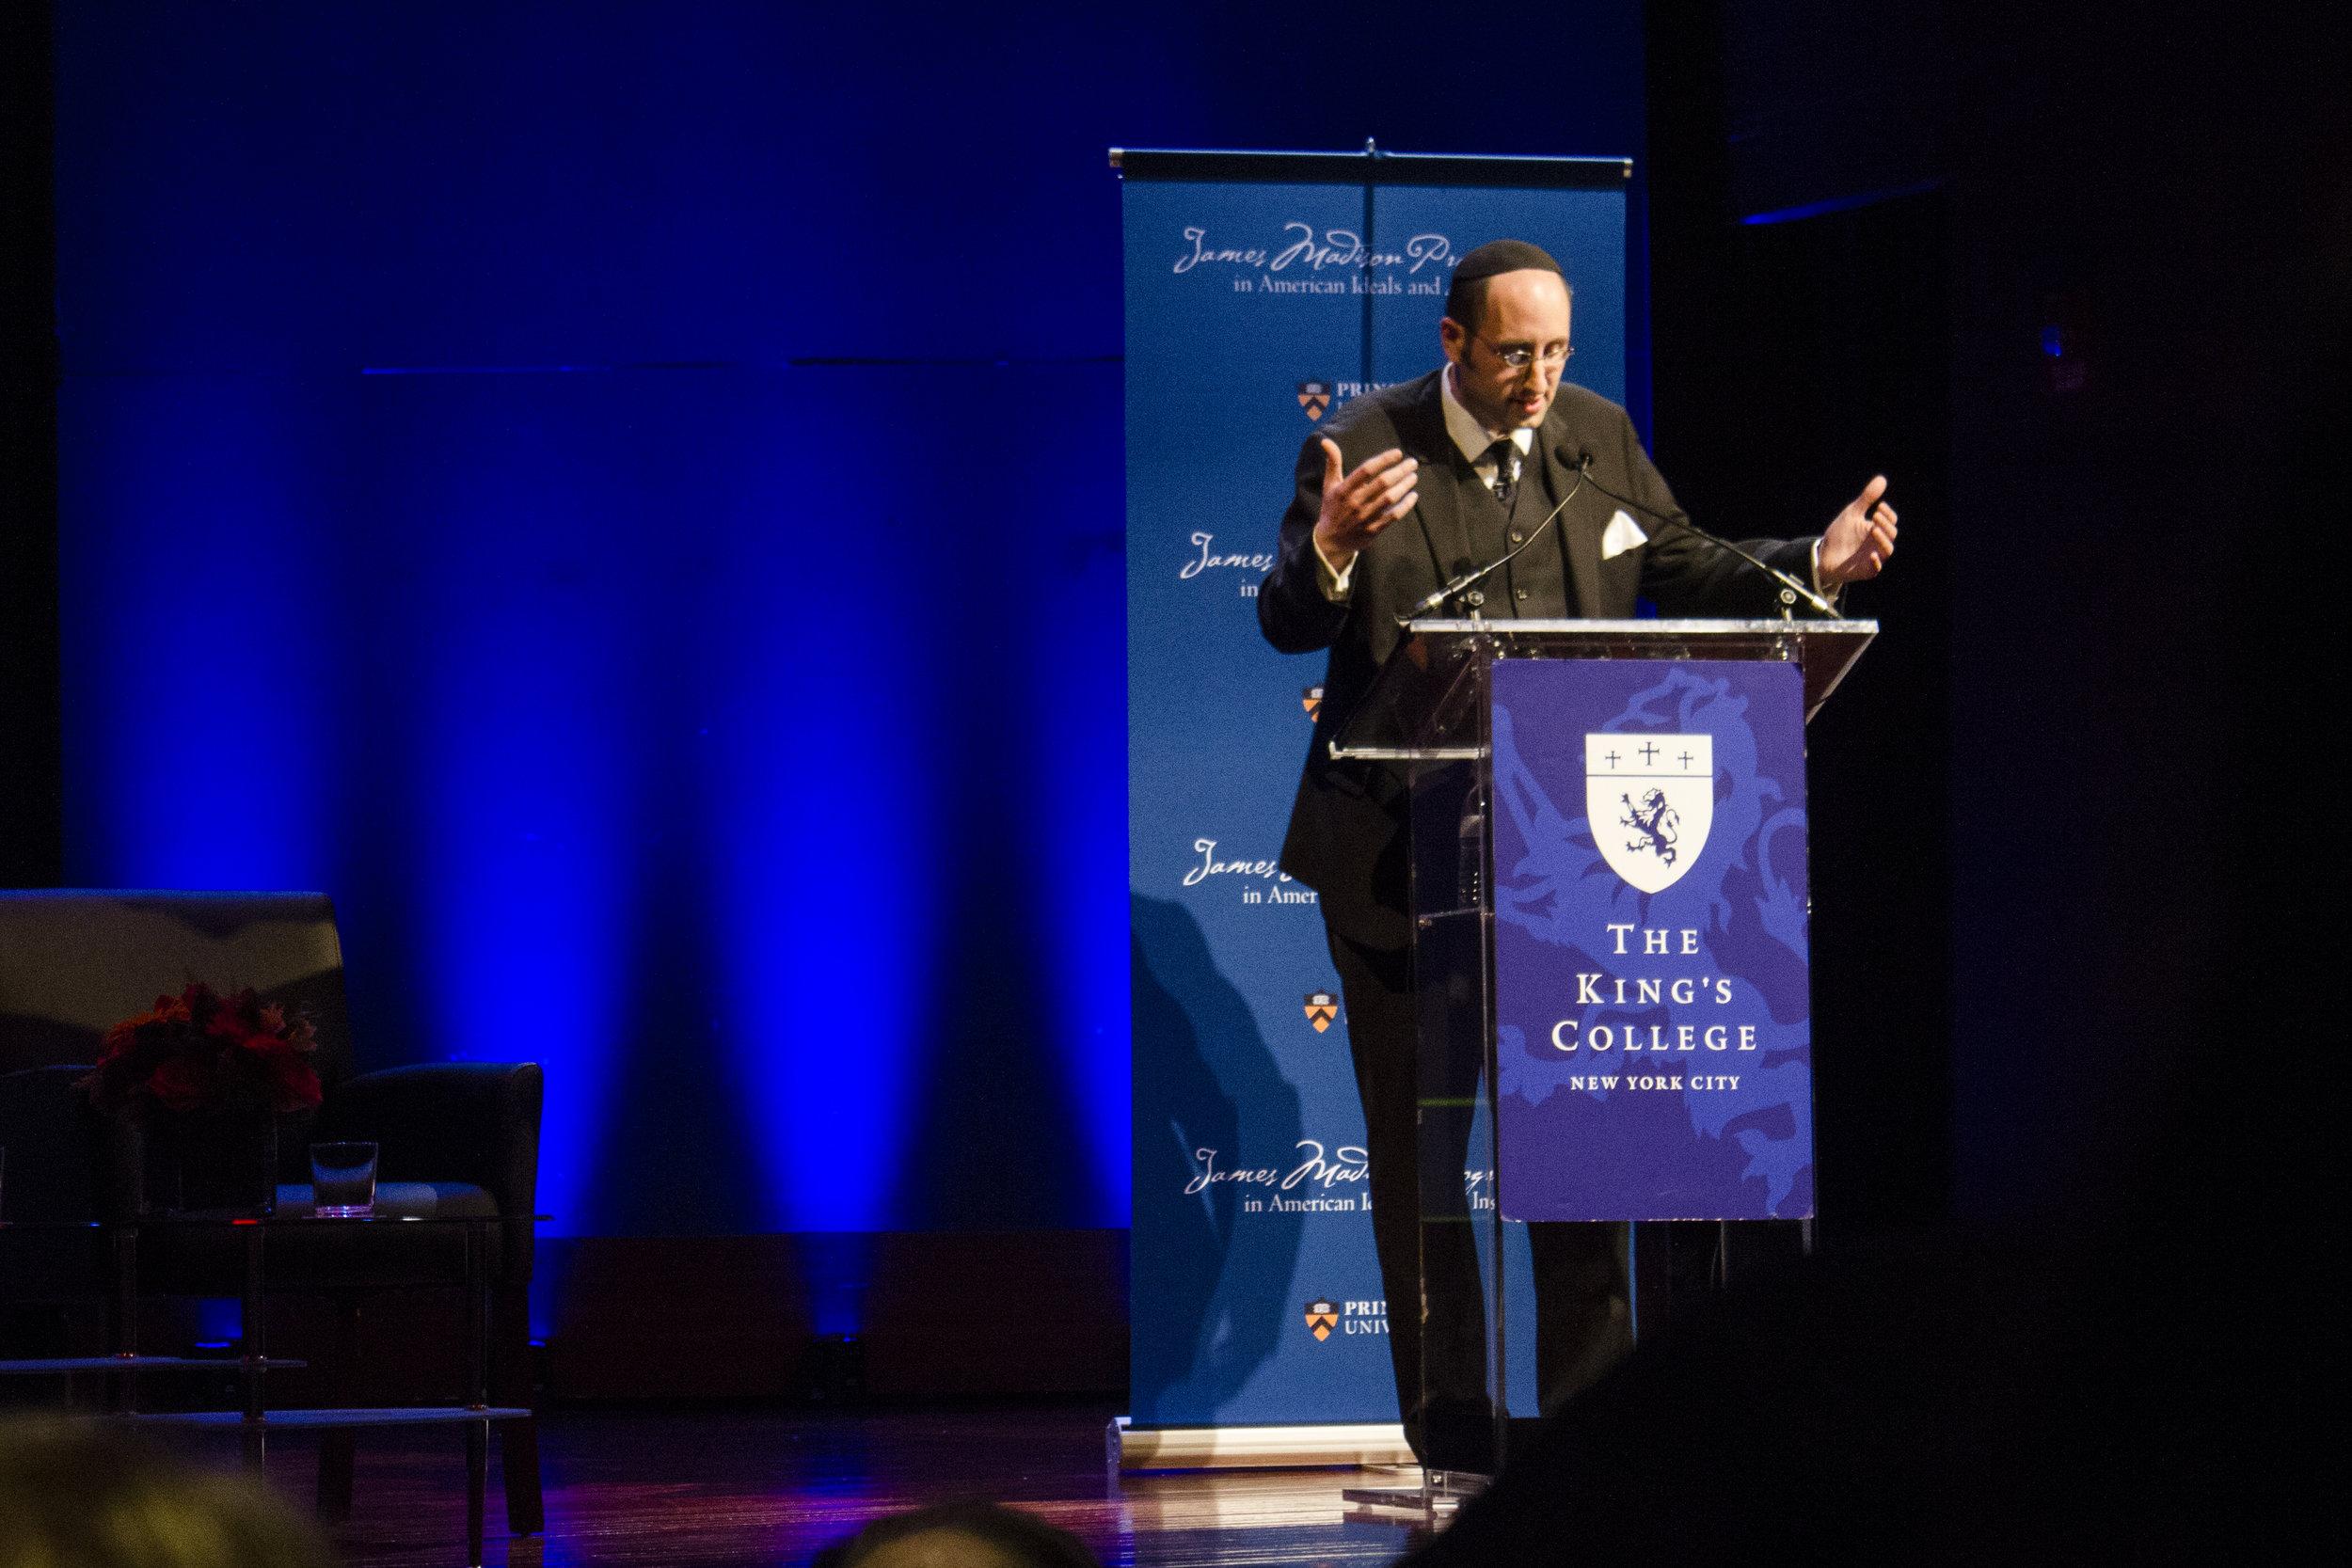 Rabbi Dr. Meir Y. Soloveichik | Photo by Bernadette Berdychowski